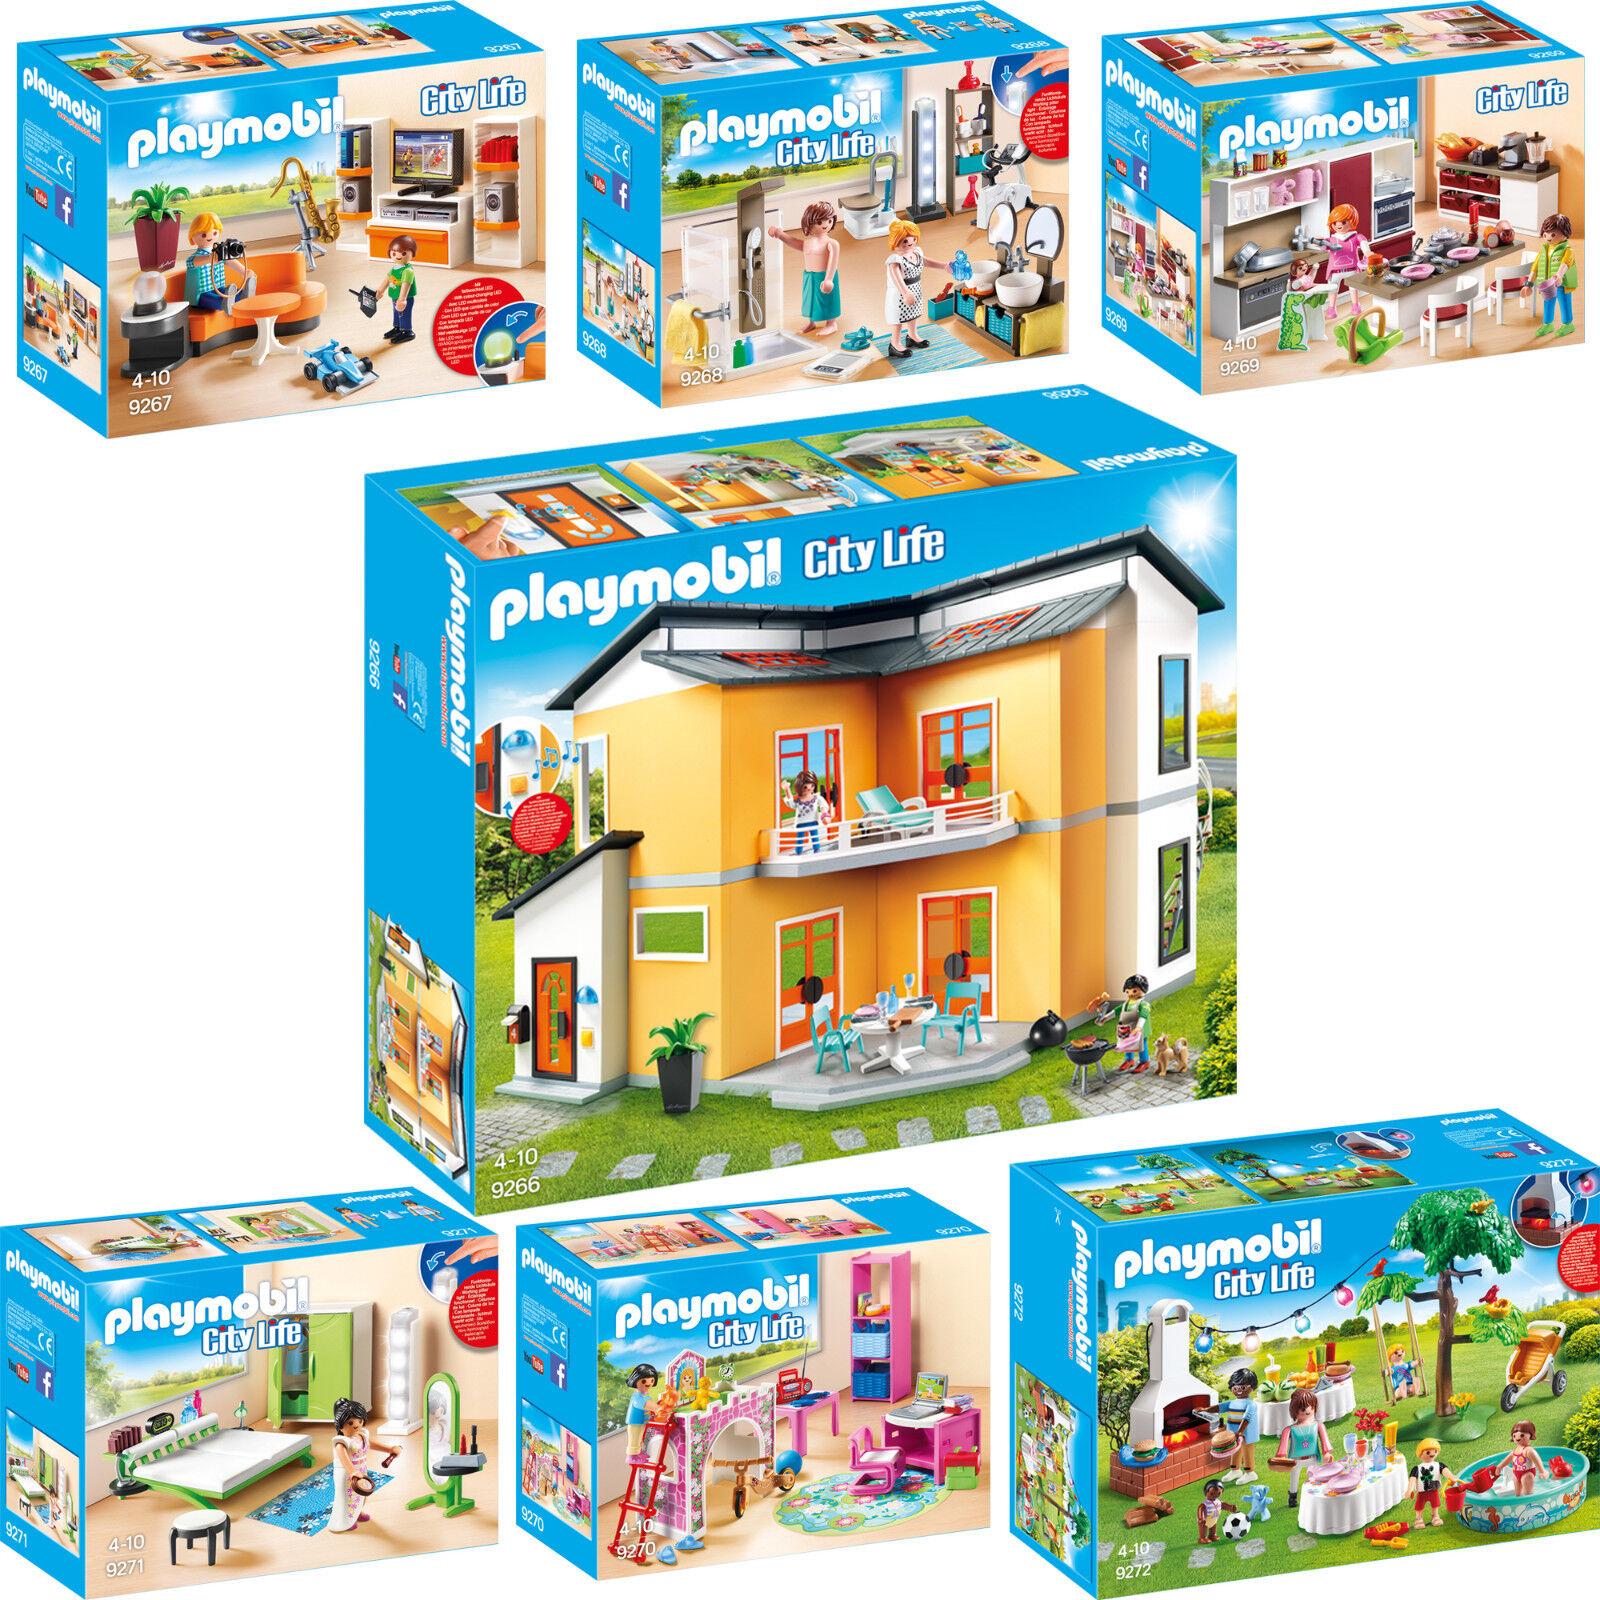 Playmobil Mitnehm Puppenhaus 5167   Playmobil